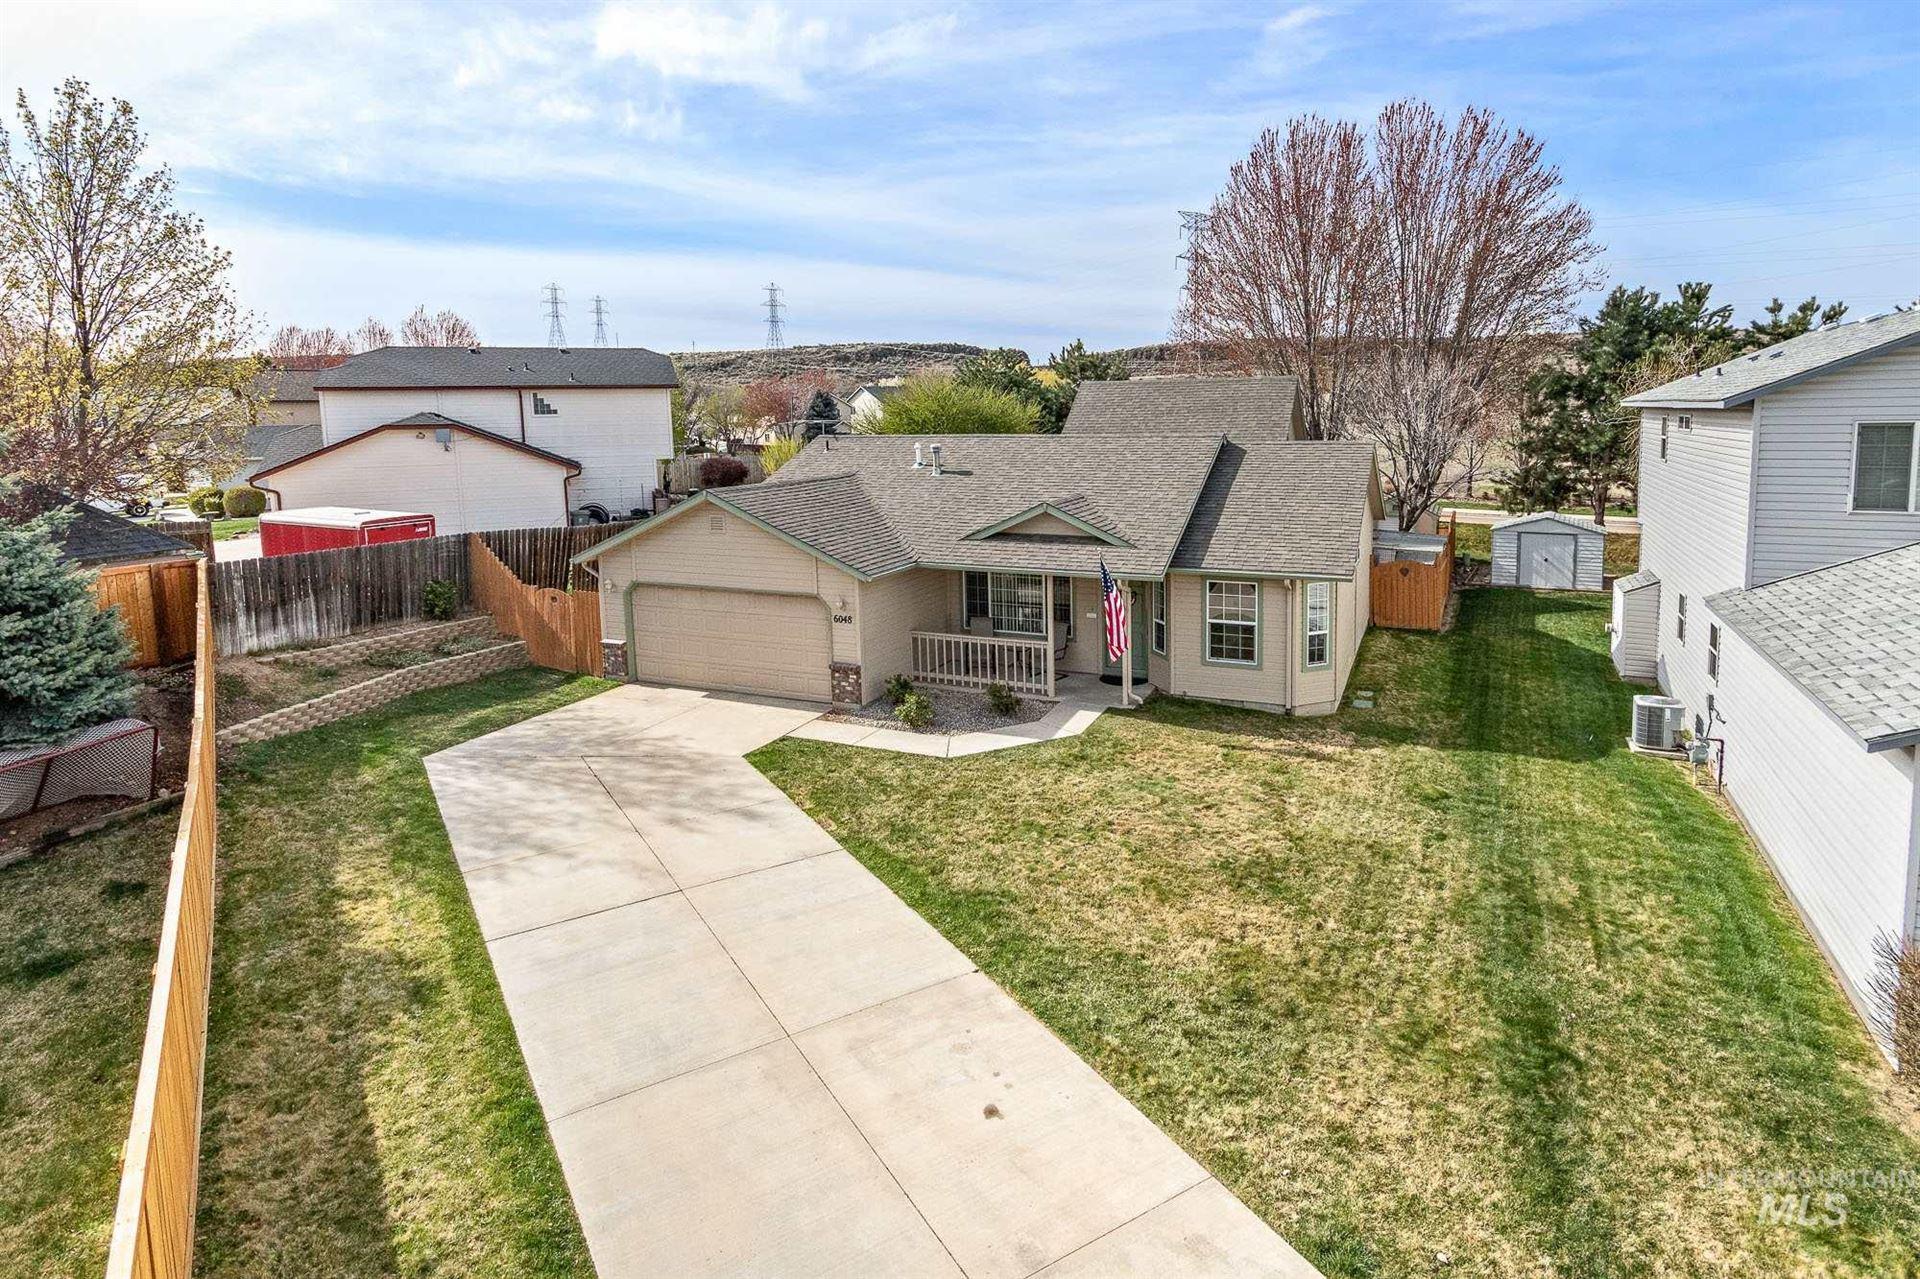 Photo of 6048 S Tulip Pl, Boise, ID 83716 (MLS # 98799724)